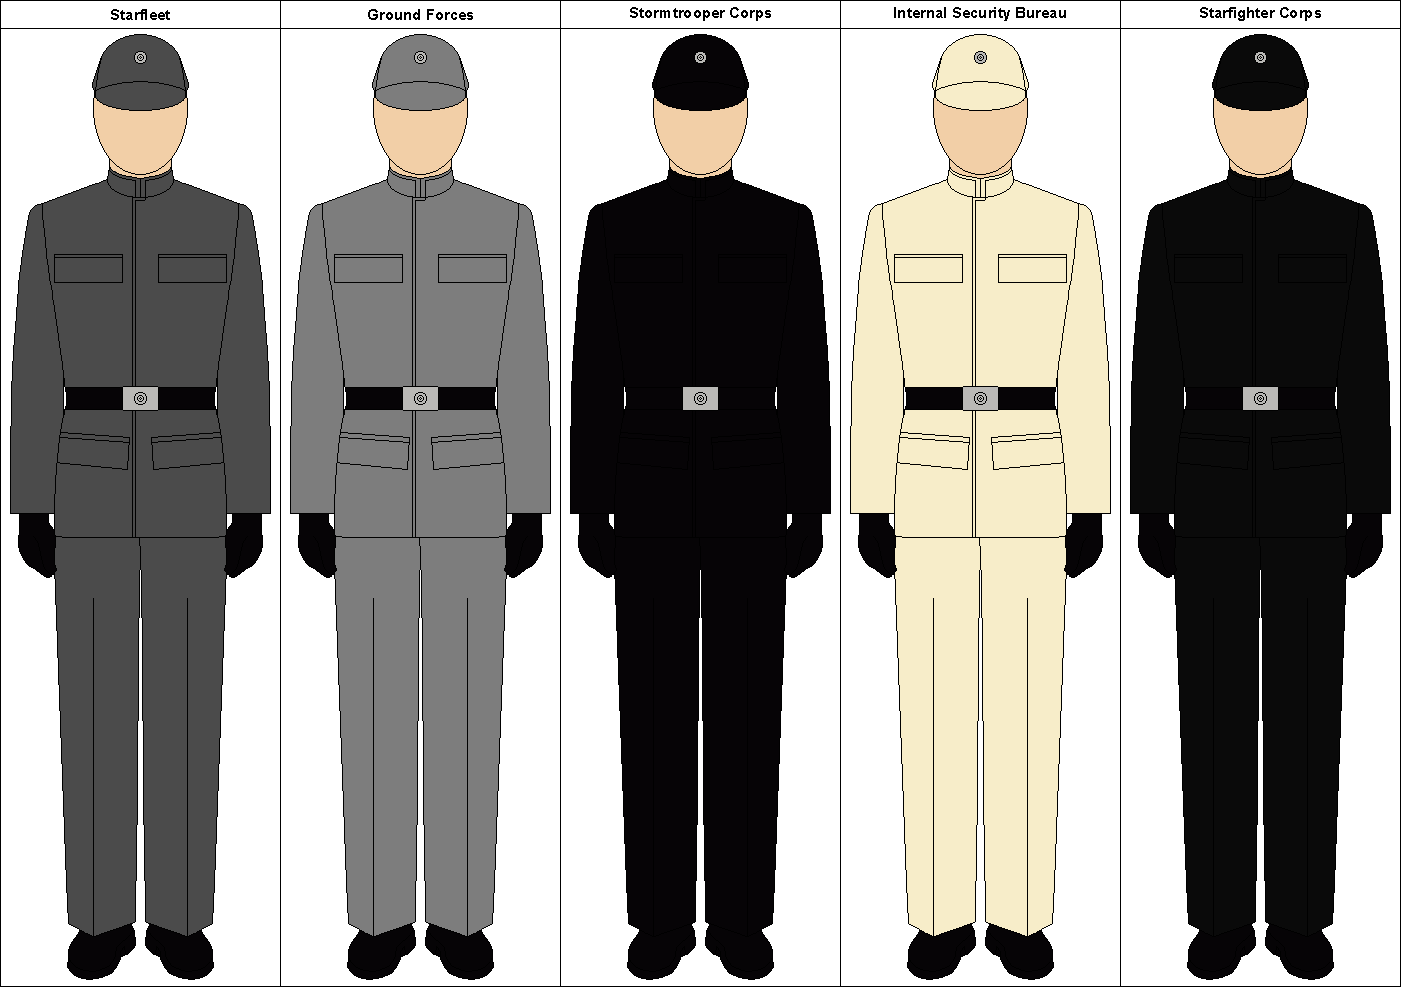 class officers design - photo #33